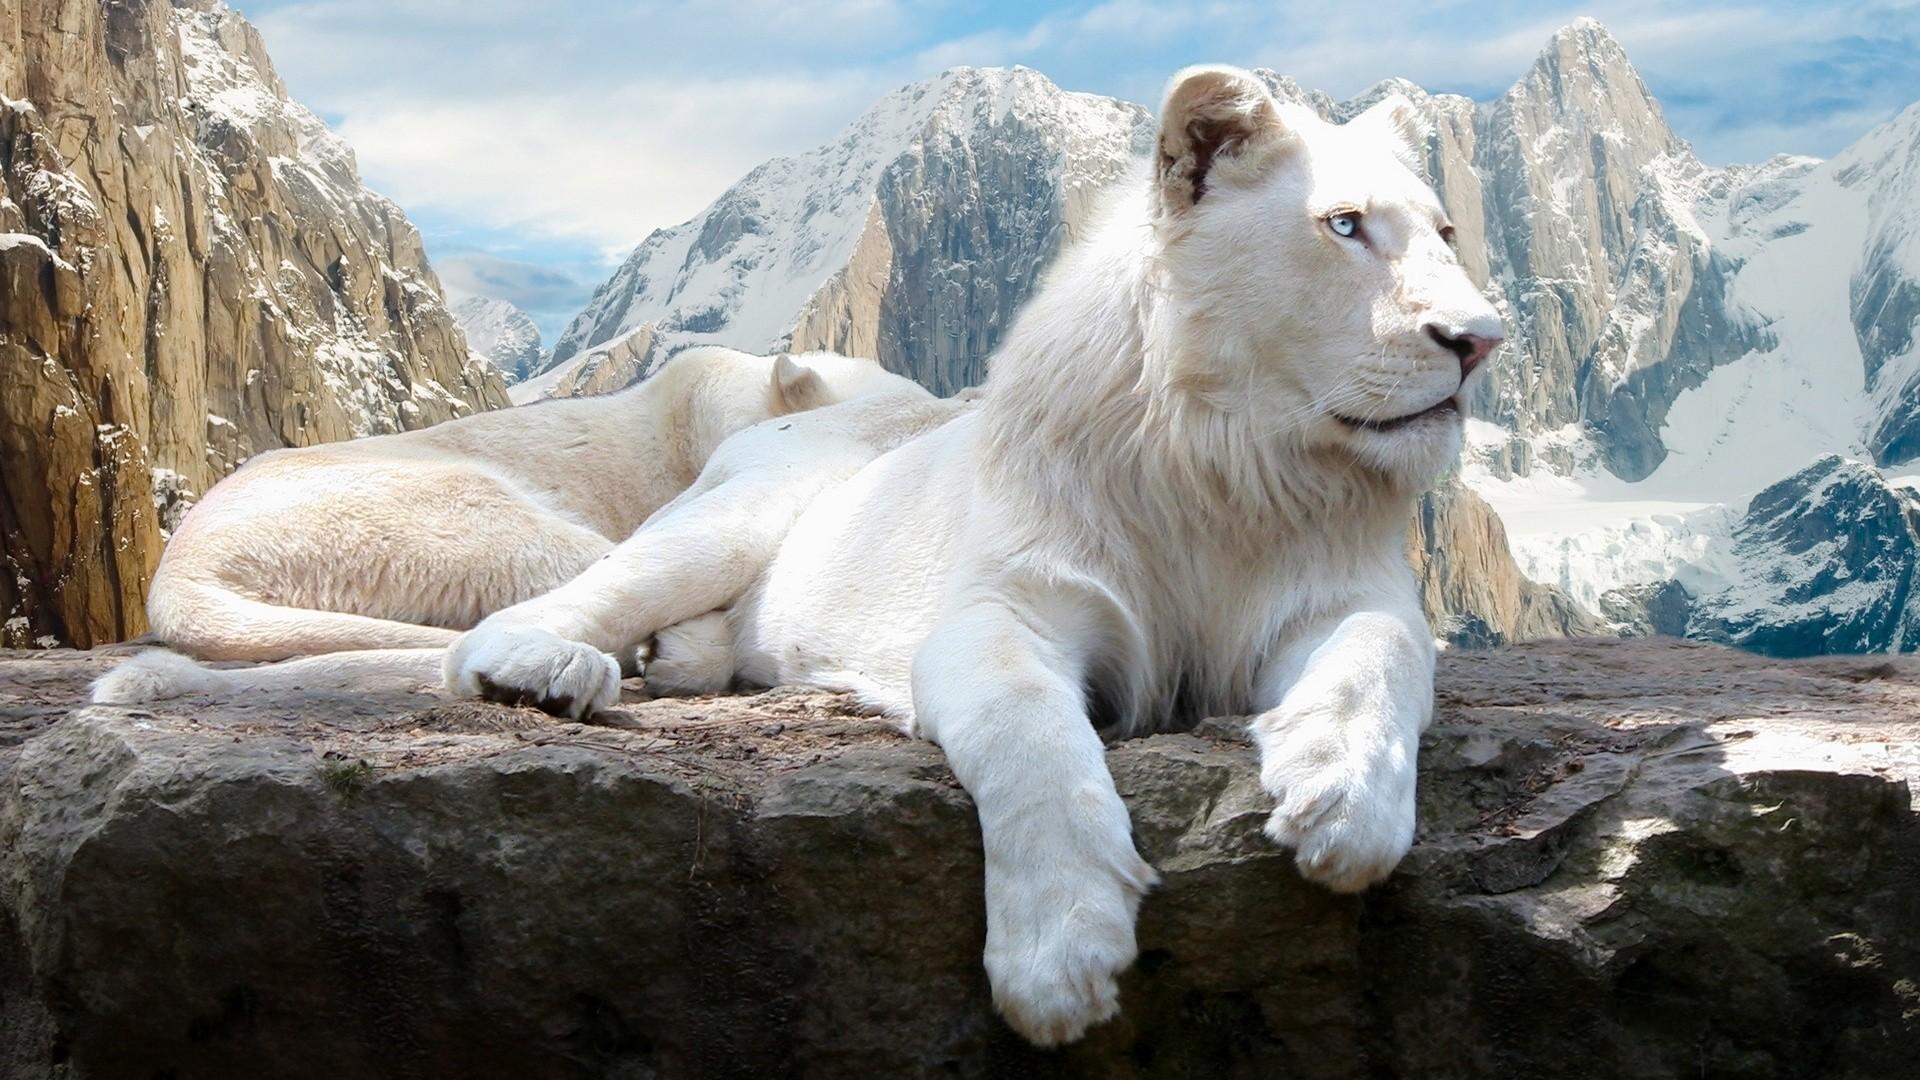 White Lions Roaring – wallpaper.